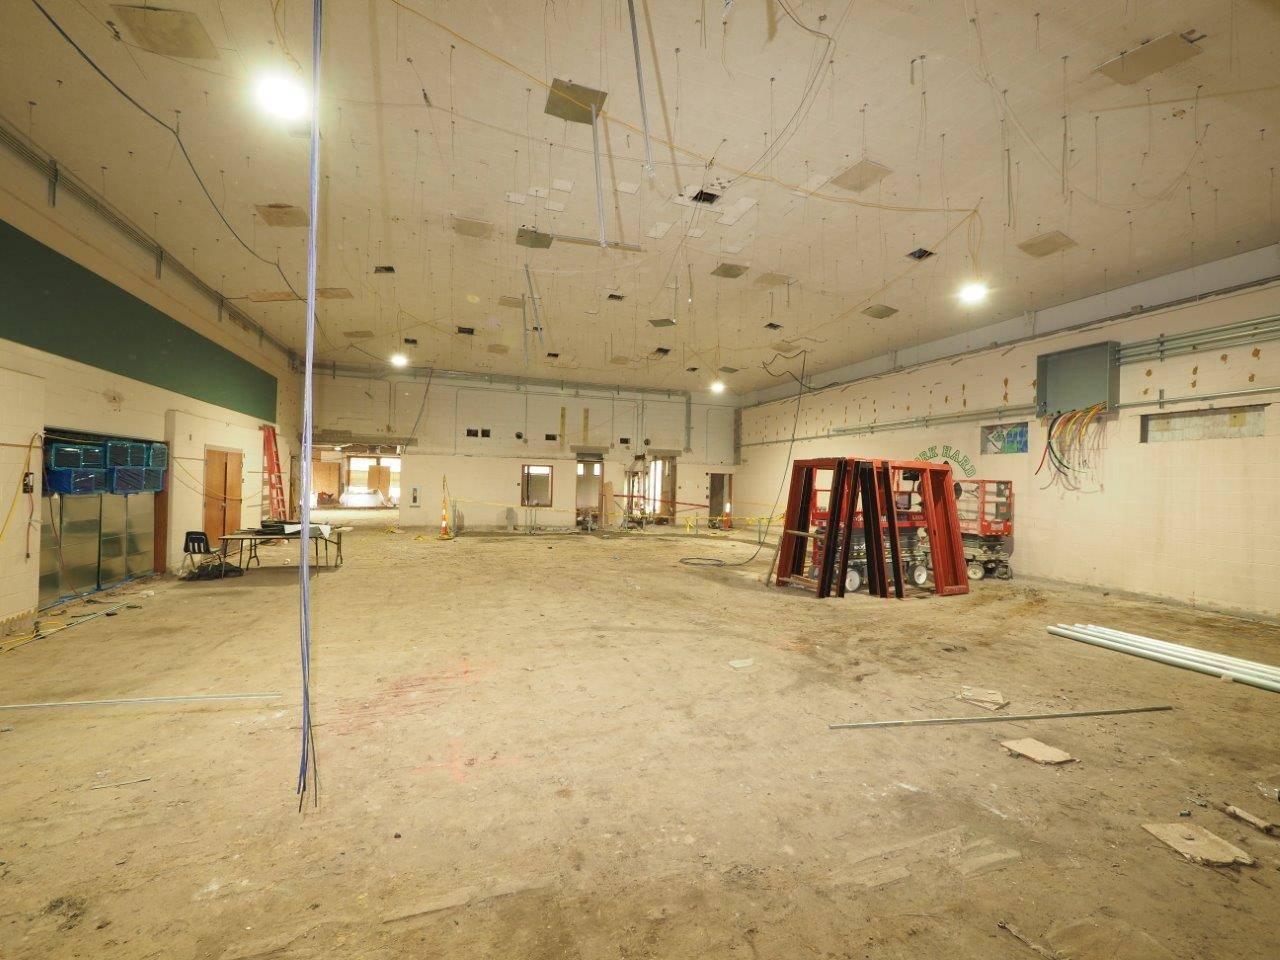 Renovation work inside Barrington Elementary School